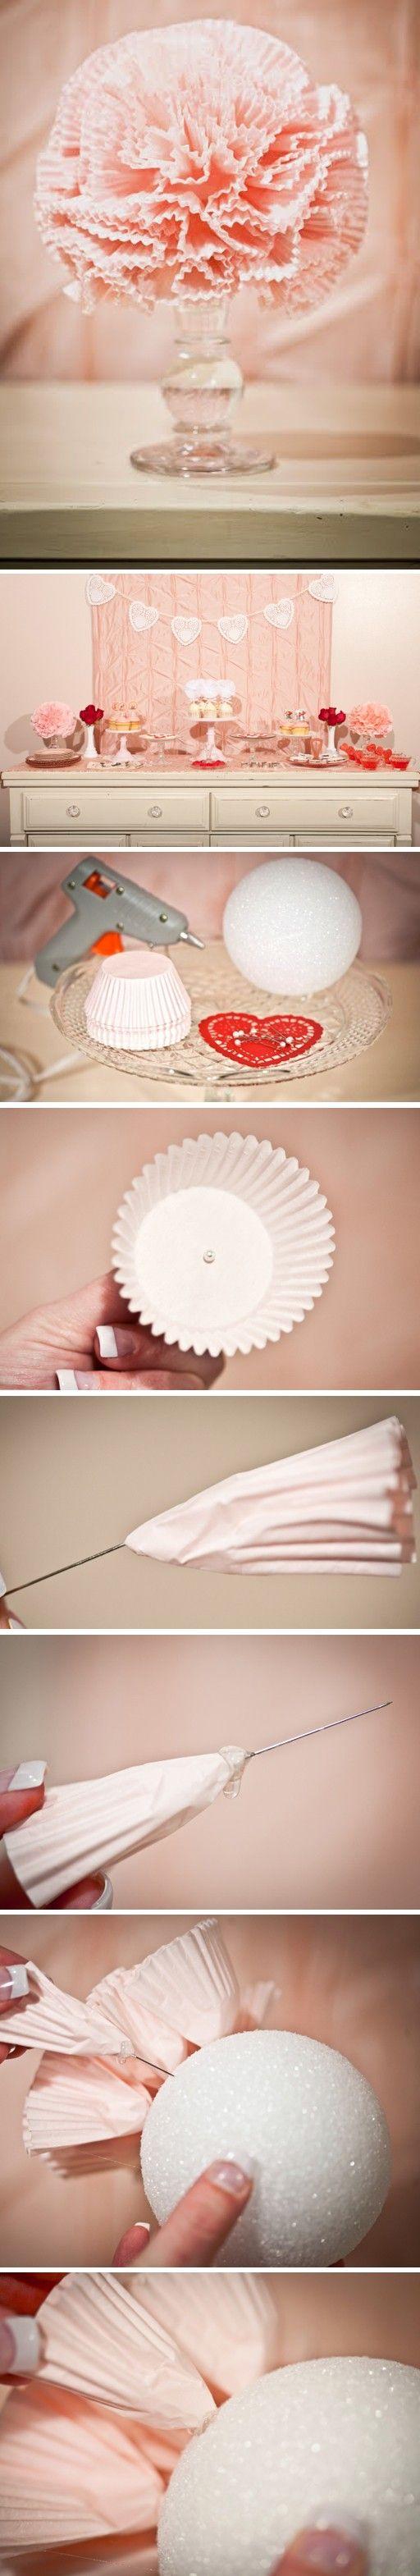 cupcake liner centerpiece!